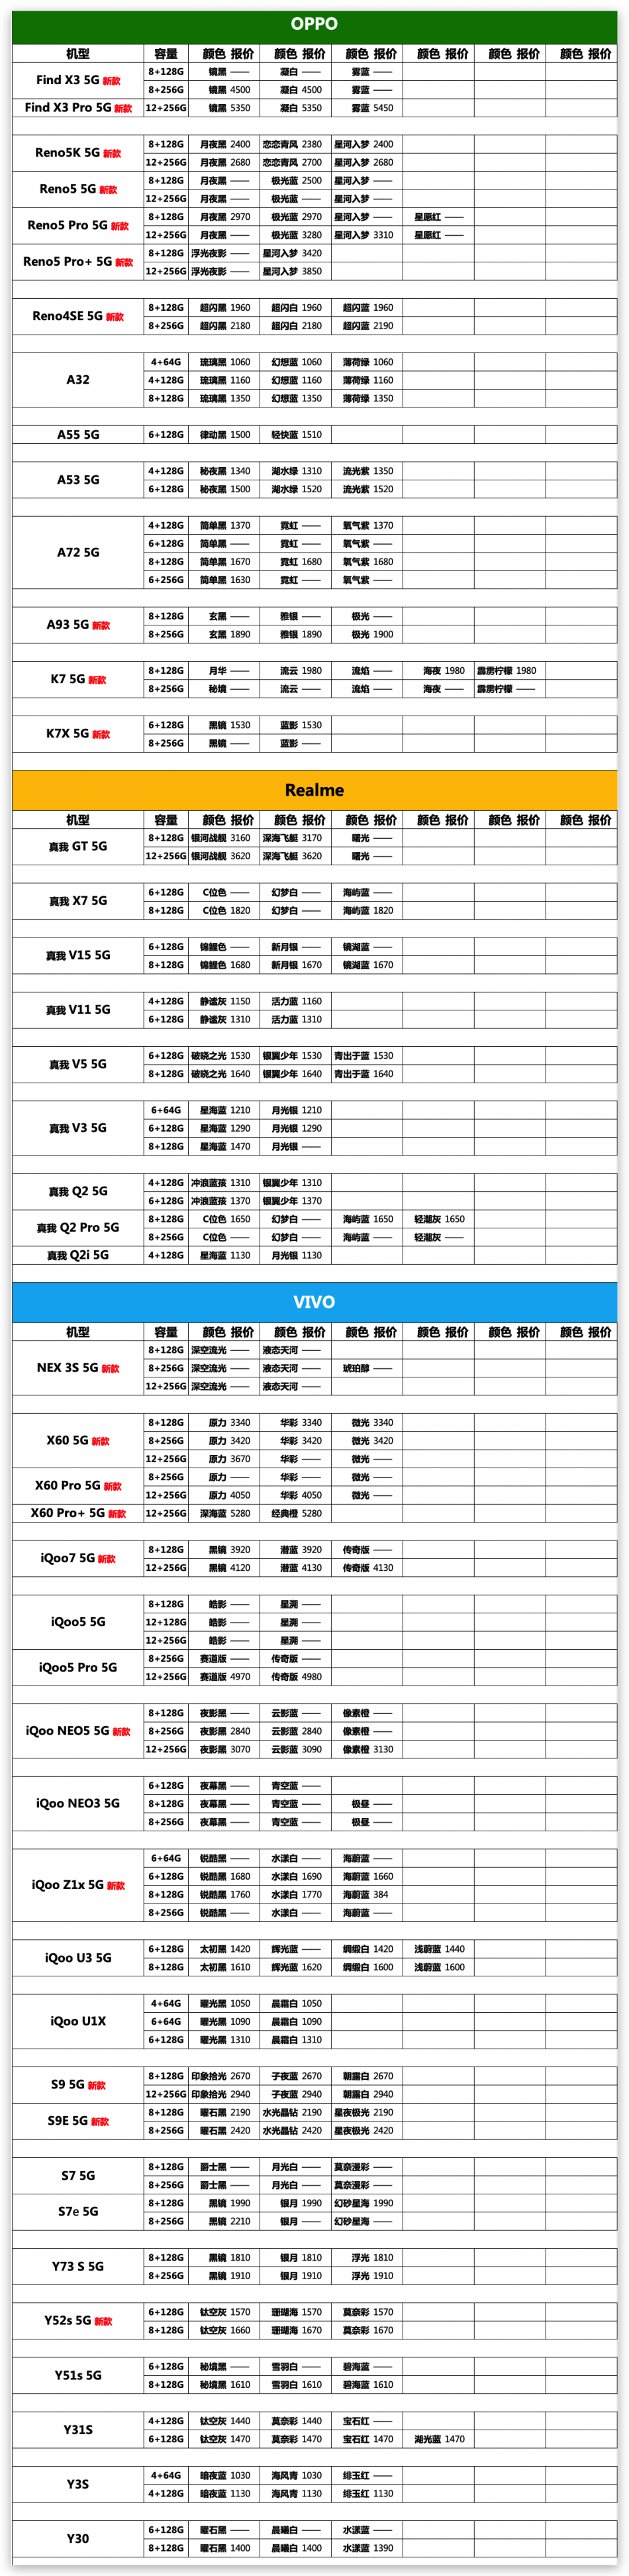 Xnip2021-04-05_14-35-37.png